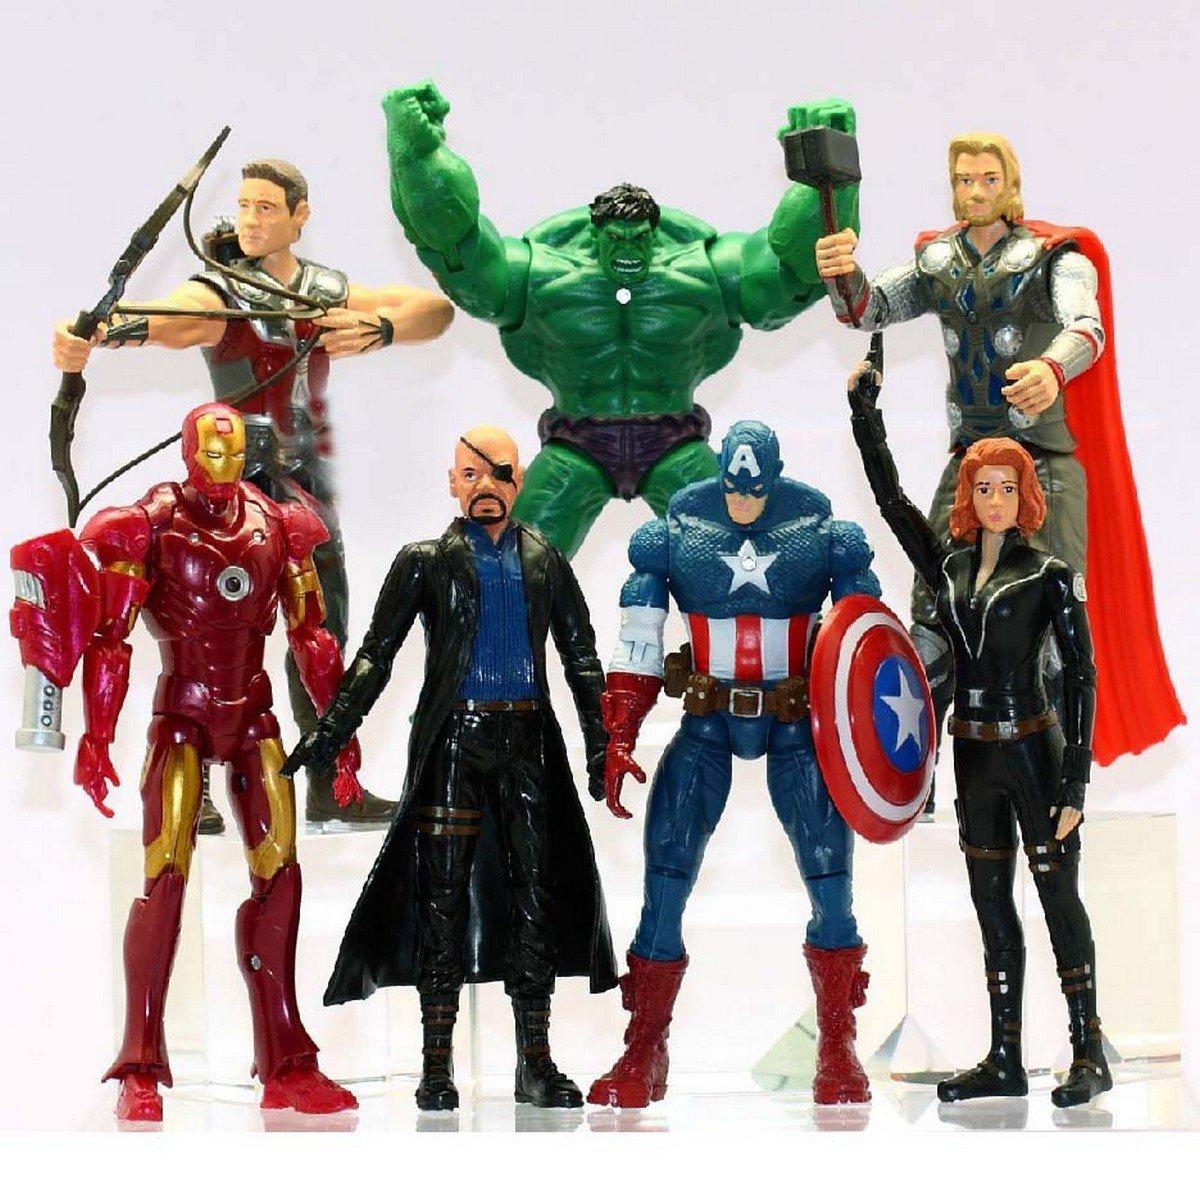 Buy 7 Pcslot Super Hero Avengers Action Figure Collectible Toys  Model Captain America,Iron Man, Ra